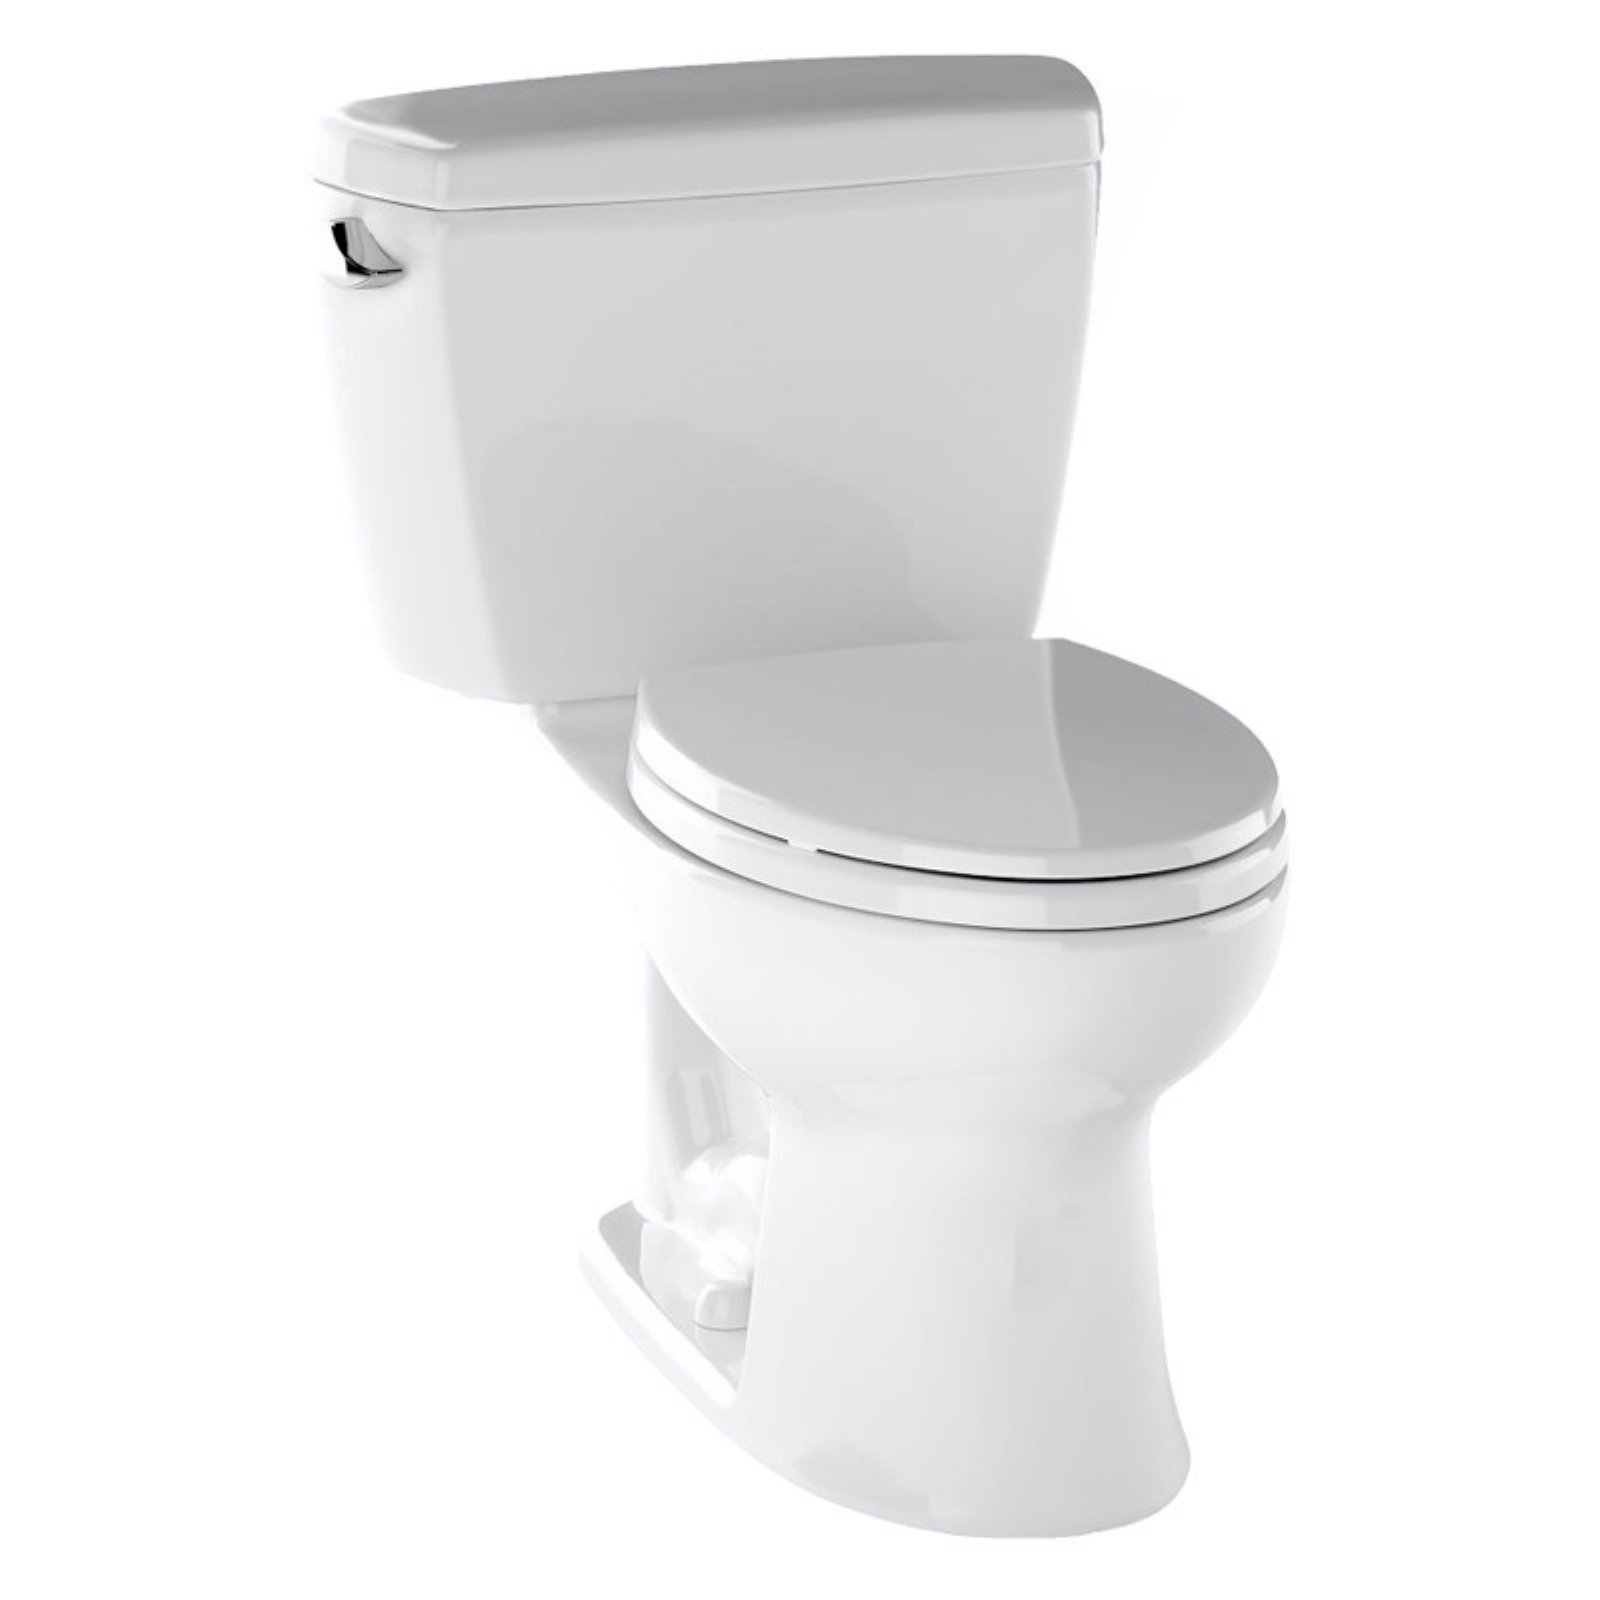 Toto Eco Drake Two Piece Toilet GPF 1.28 Elongated with E-Max Flush ...